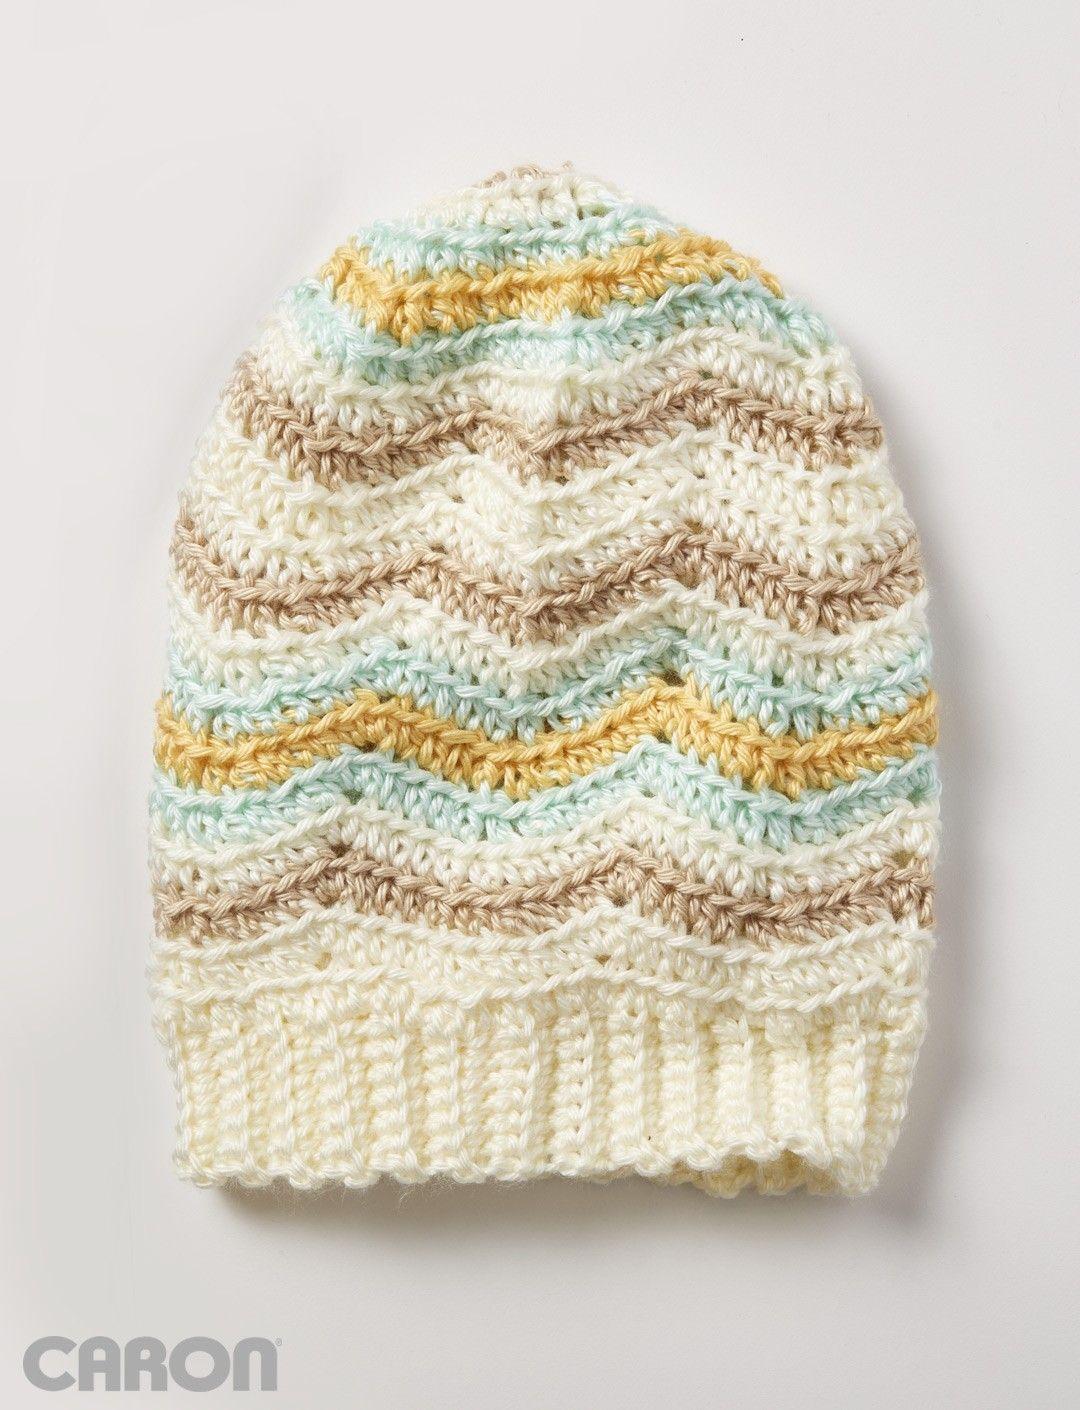 Yarnspirations.com - Caron Zig Zag Hat Free Pattern | Yarnspirations ...